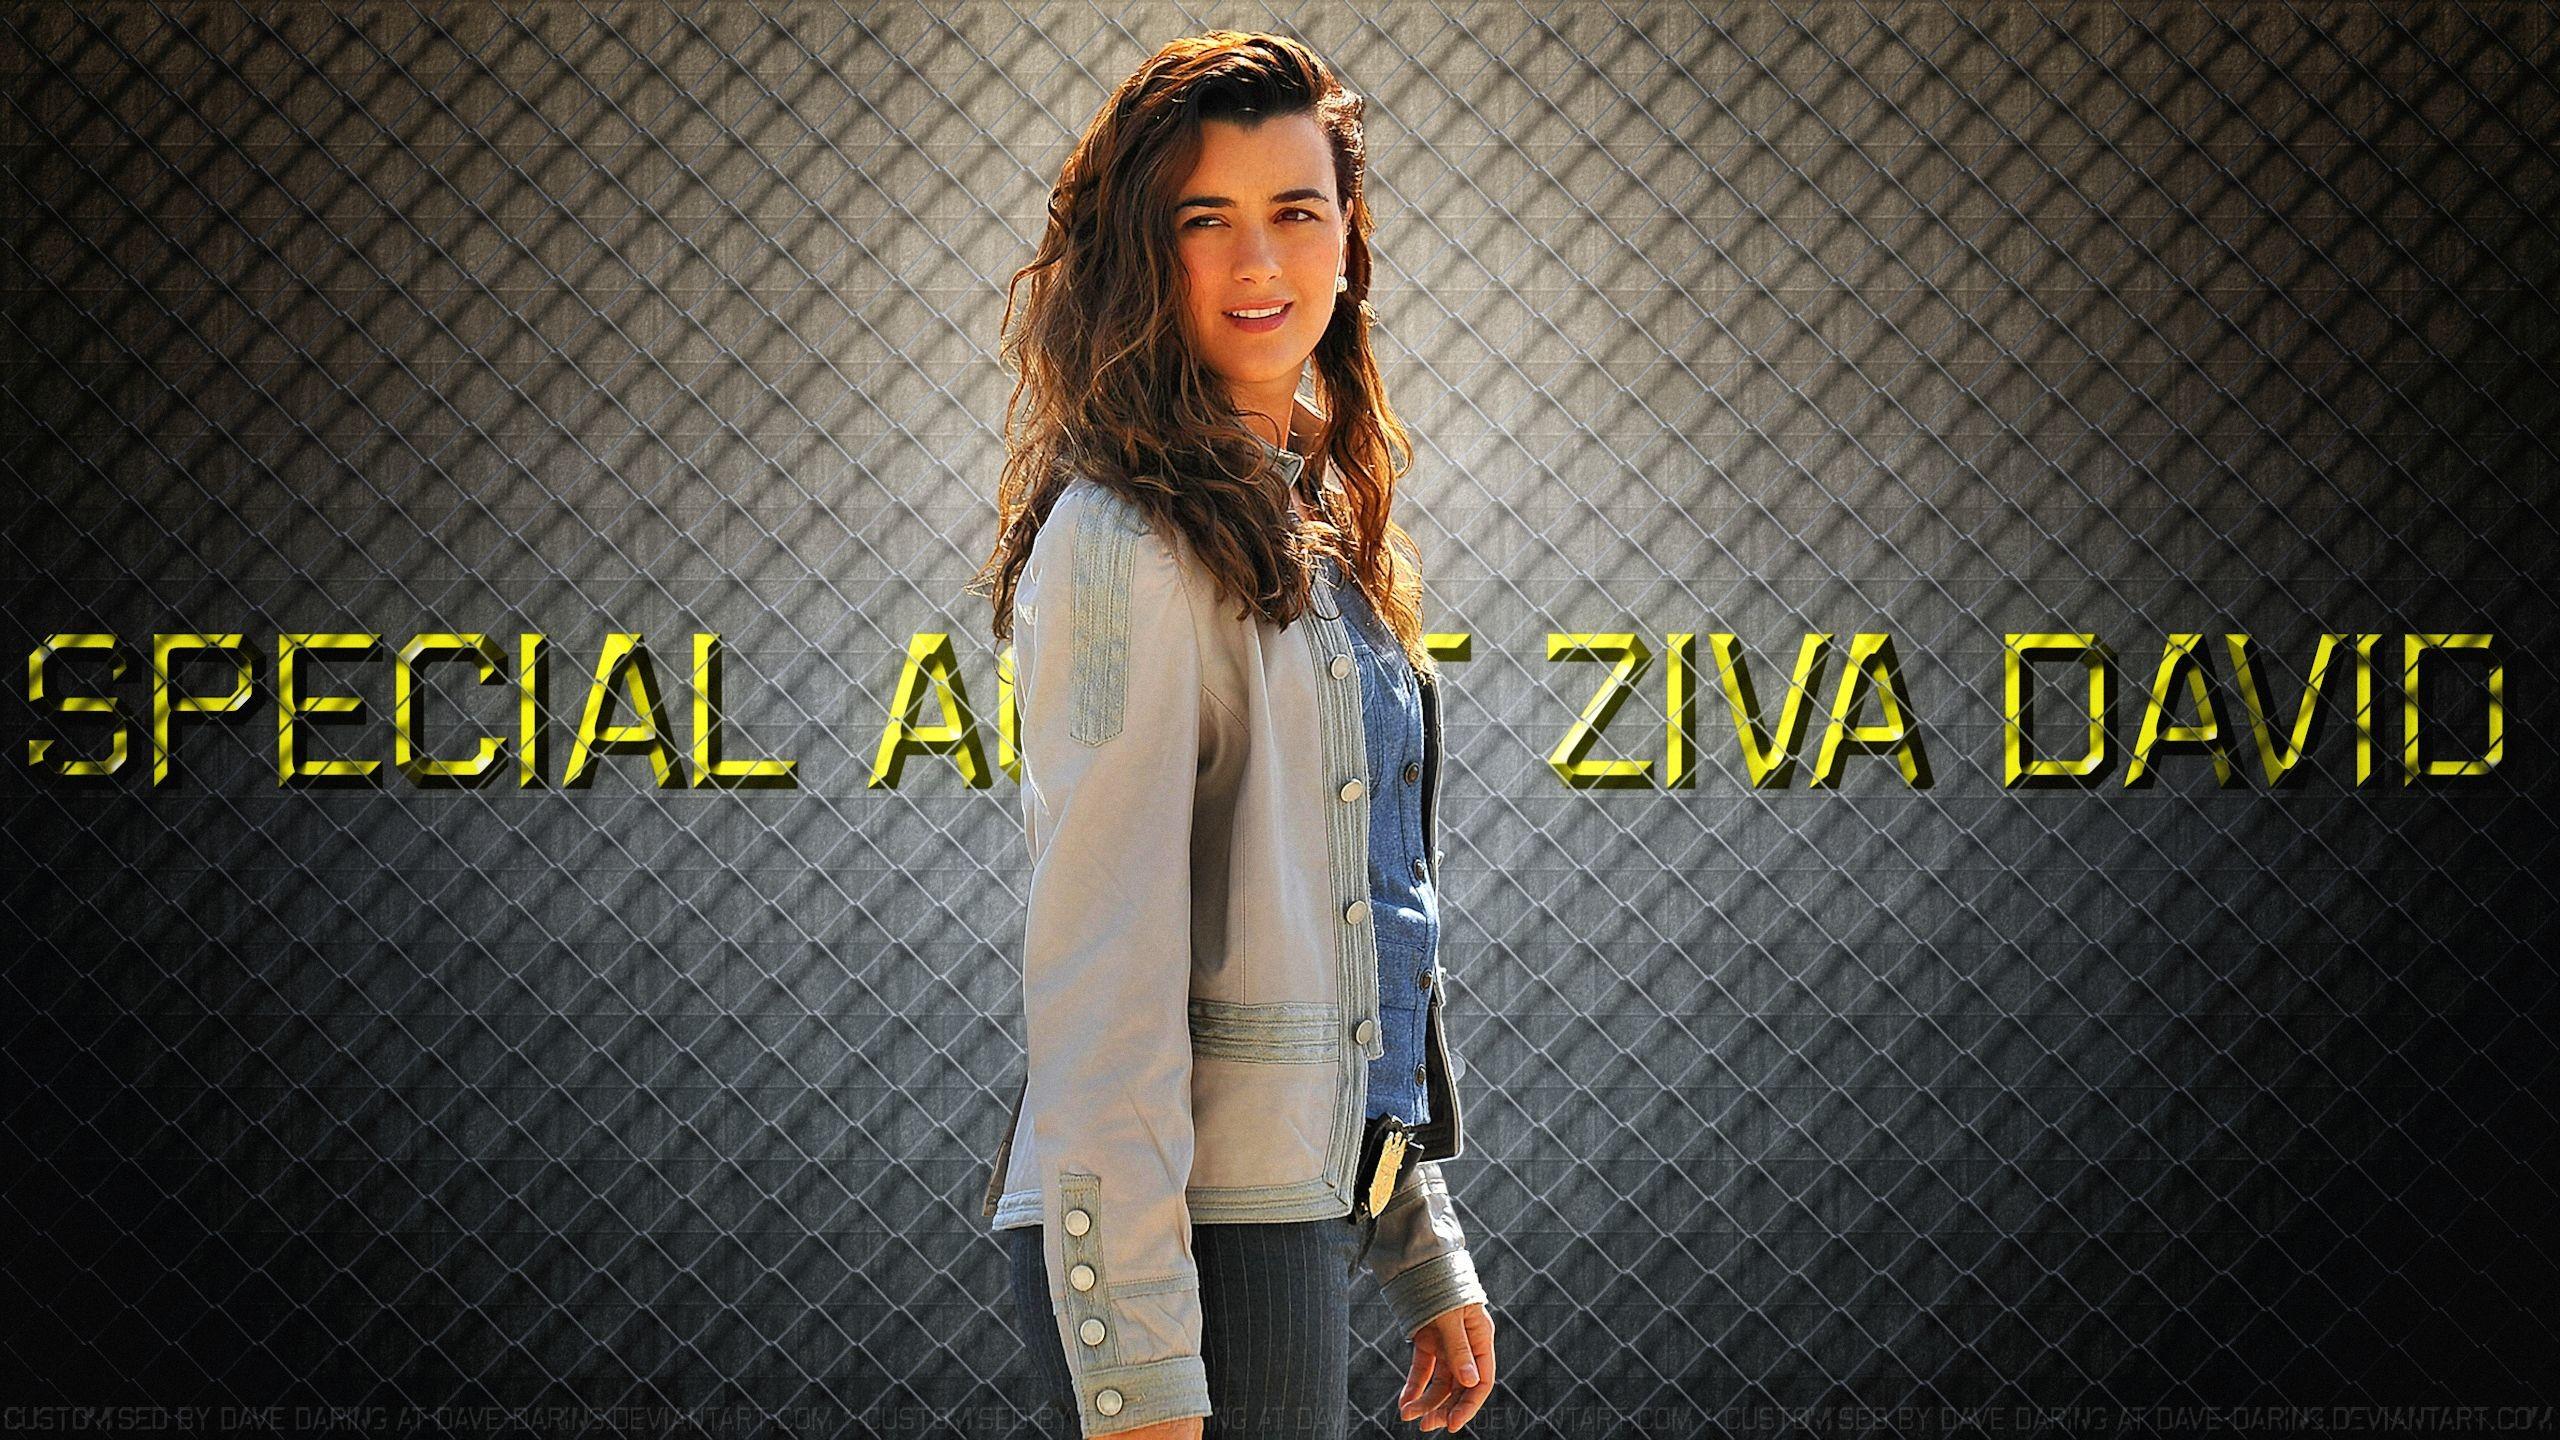 Res: 2560x1440, ... Cote De Pablo Special Agent Ziva David VII by Dave-Daring